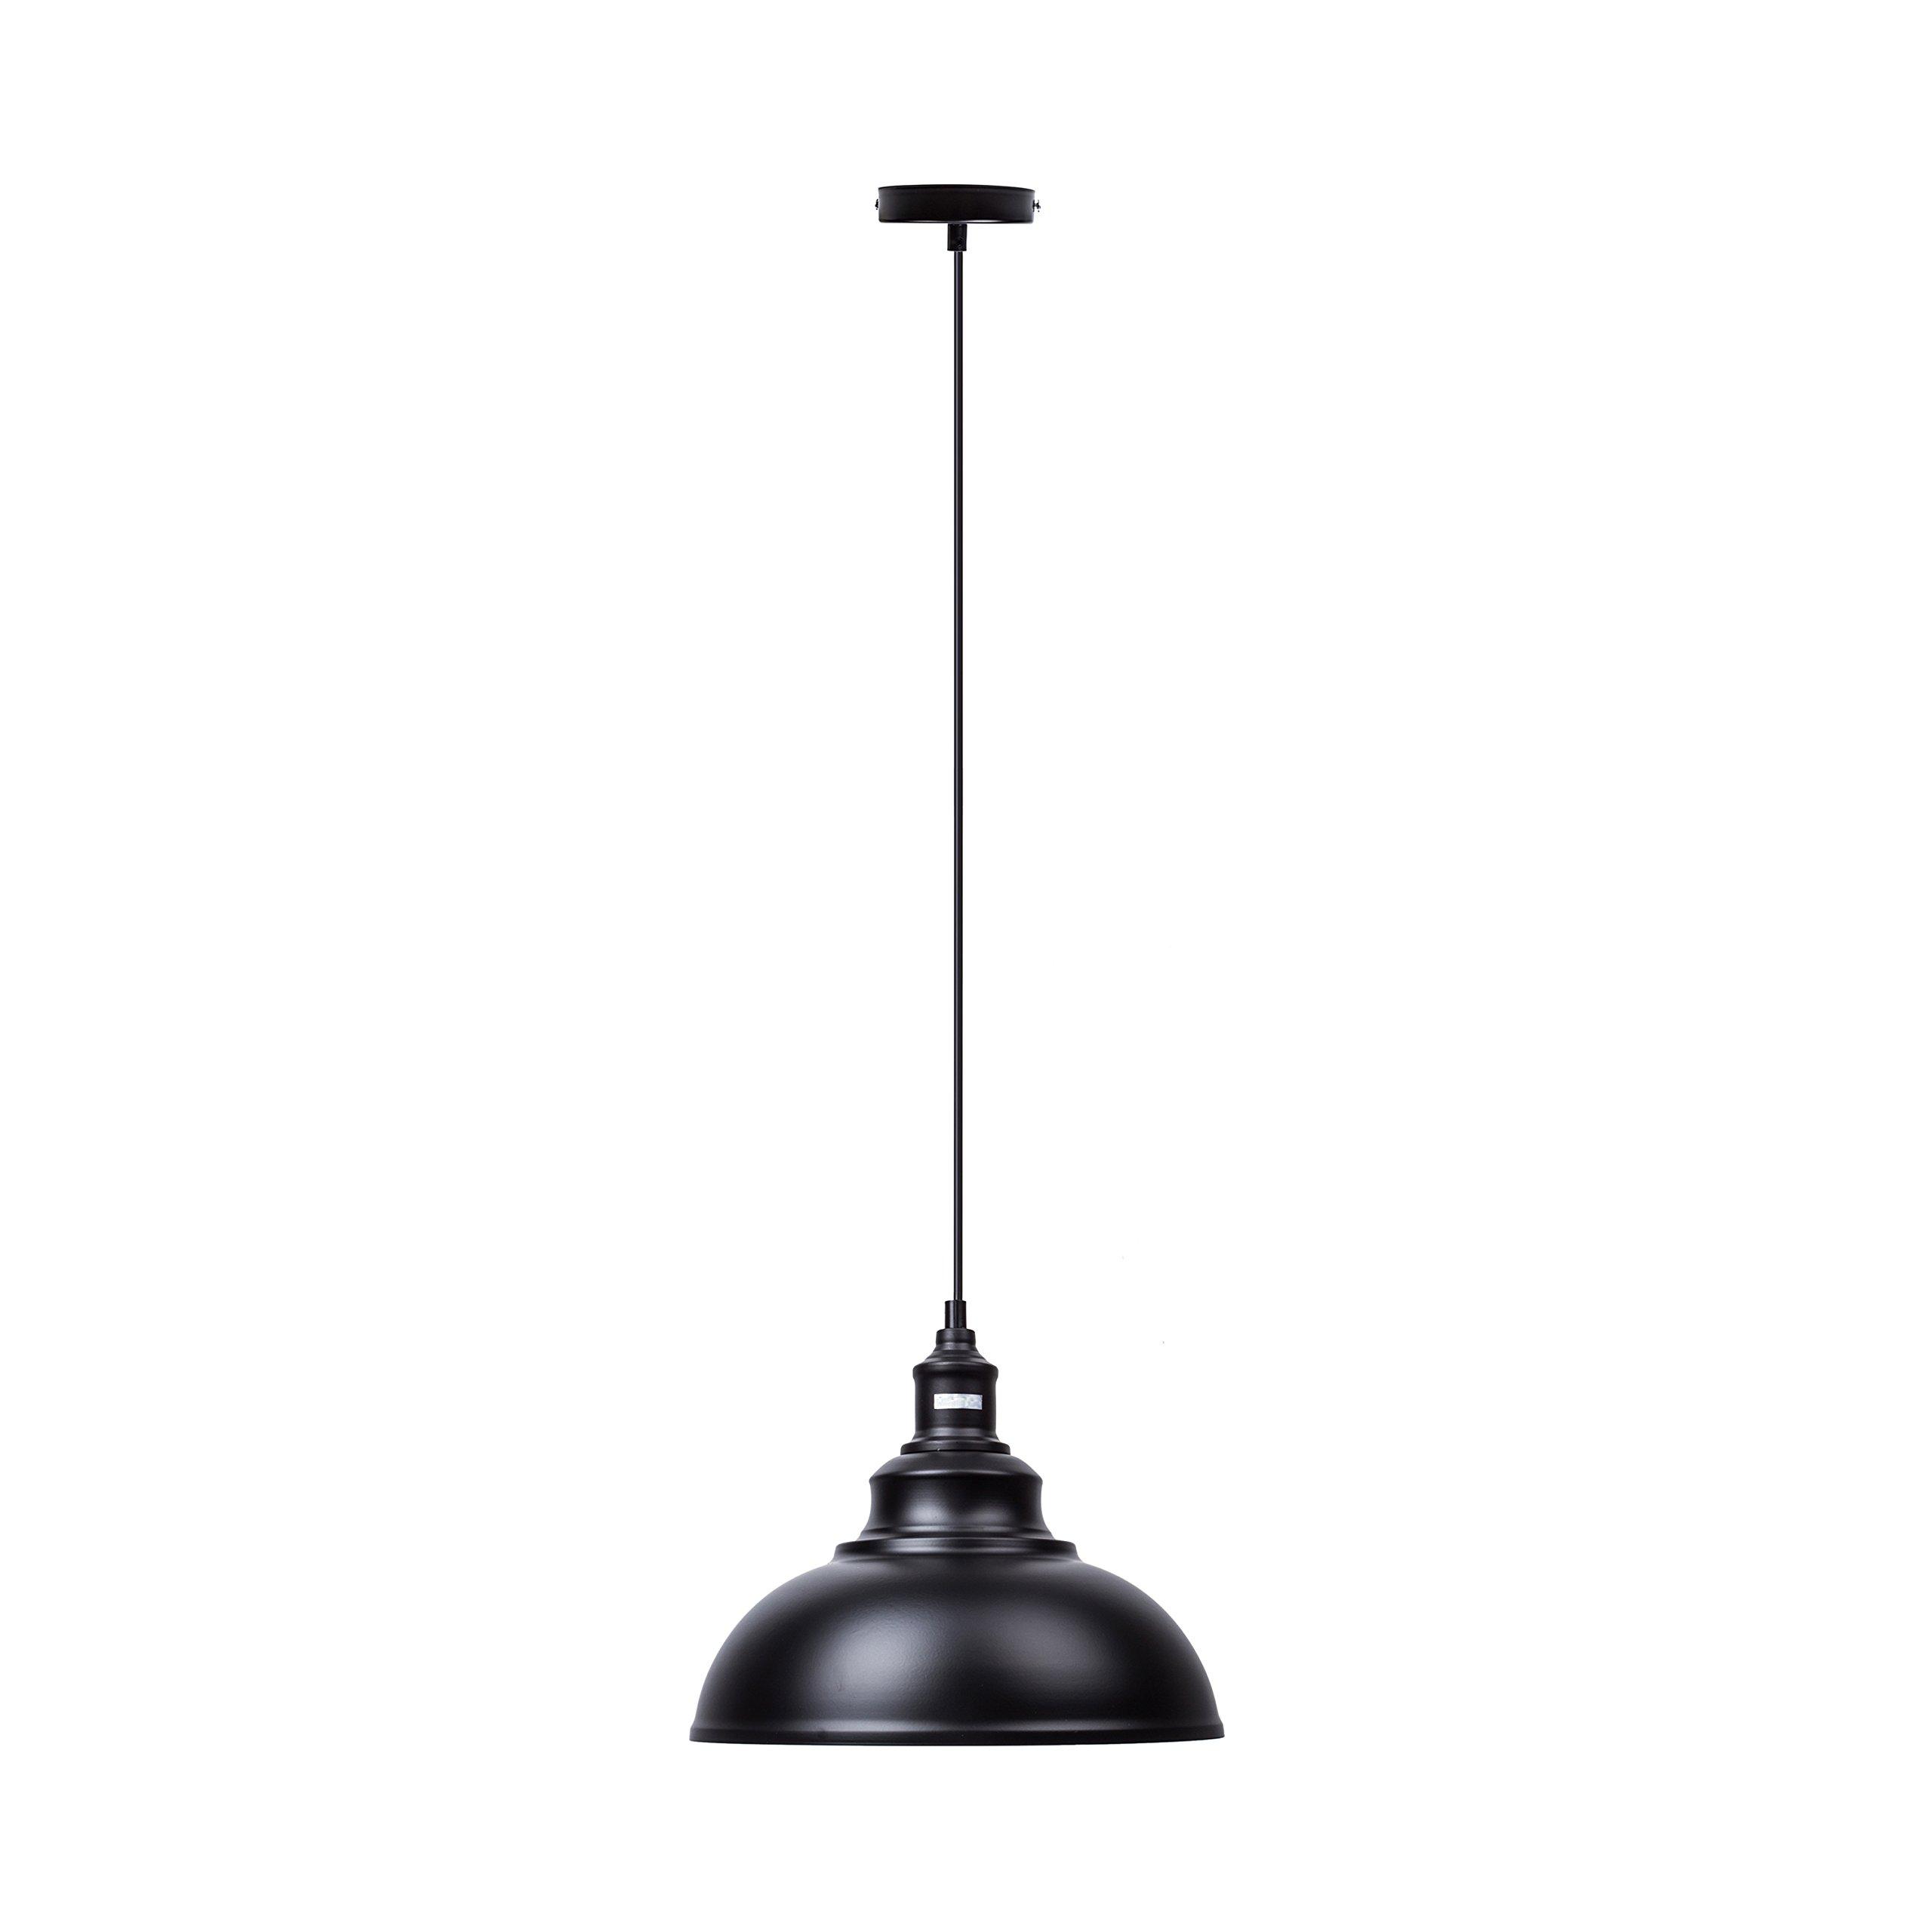 Lightess Industrial Pendant Light Vintage Black Hanging Lights Metal Edison Ceiling Mount Fixture Lighting